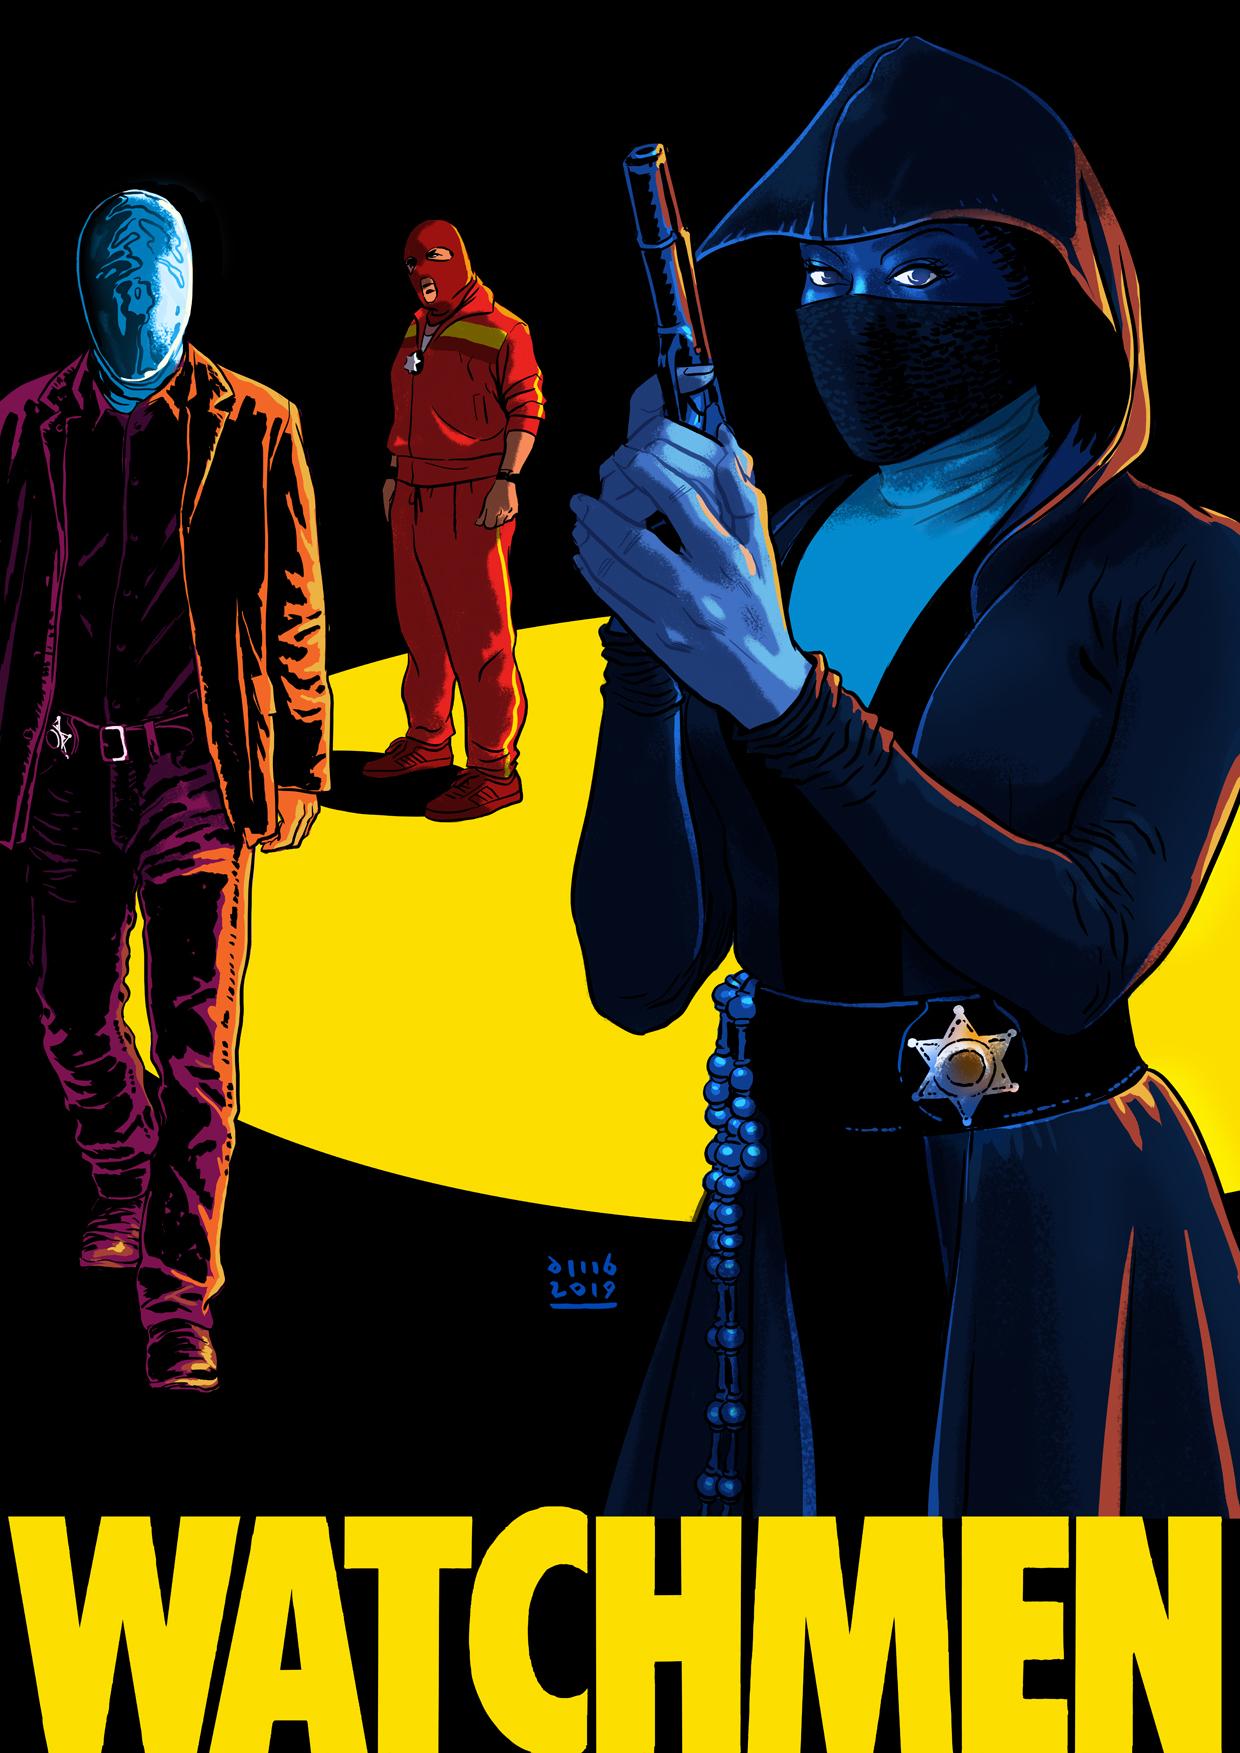 Resultado de imagem para watchmen hbo poster